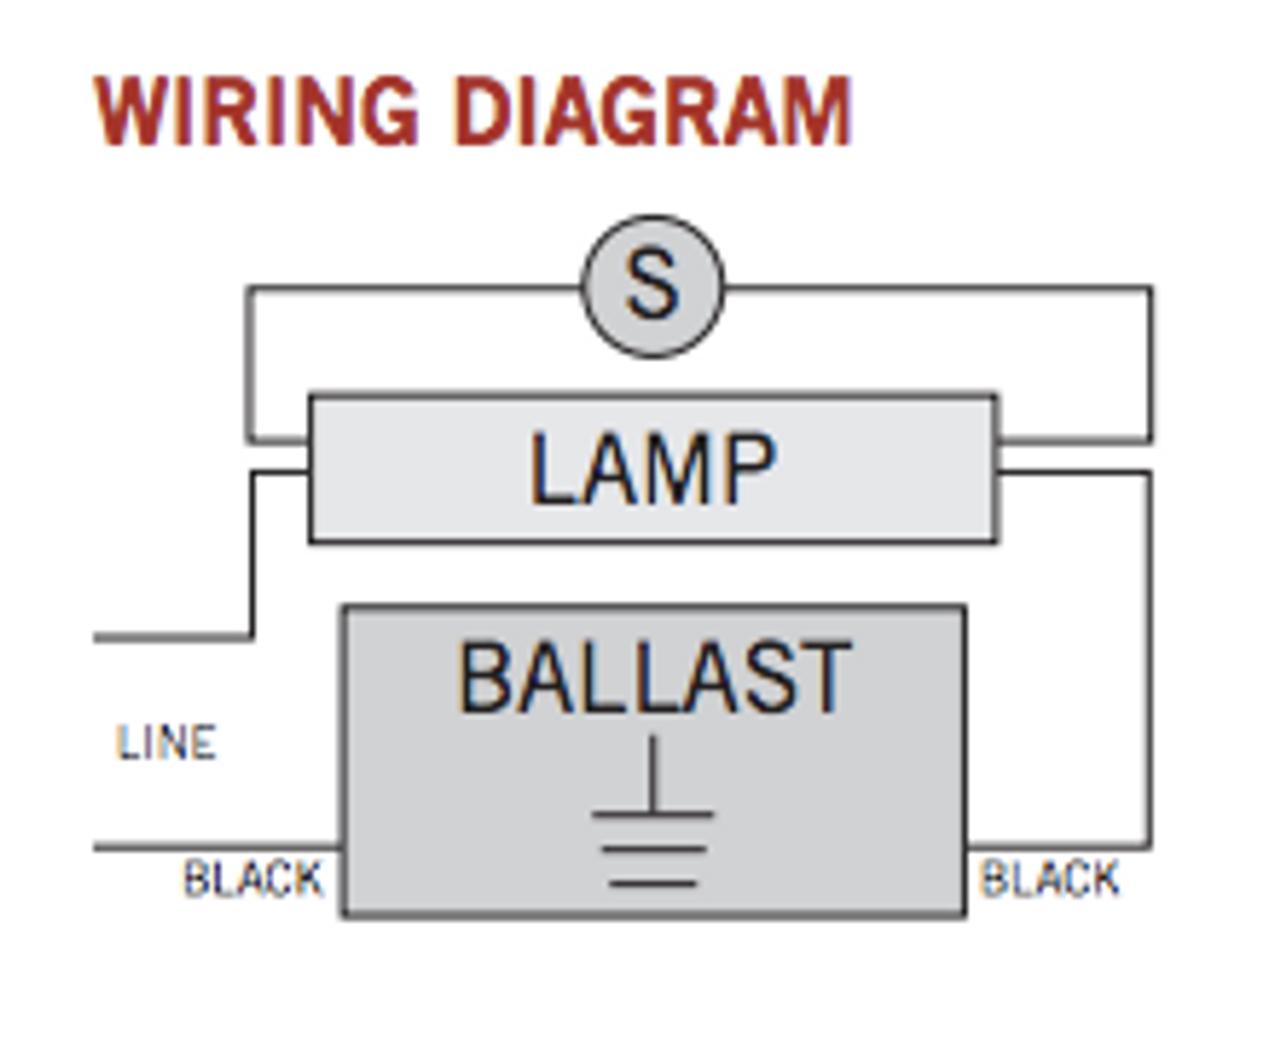 CC1322MTP Keystone Magnetic Fluorescent Ballast fluorescent ballast wiring diagram BallastShop.com